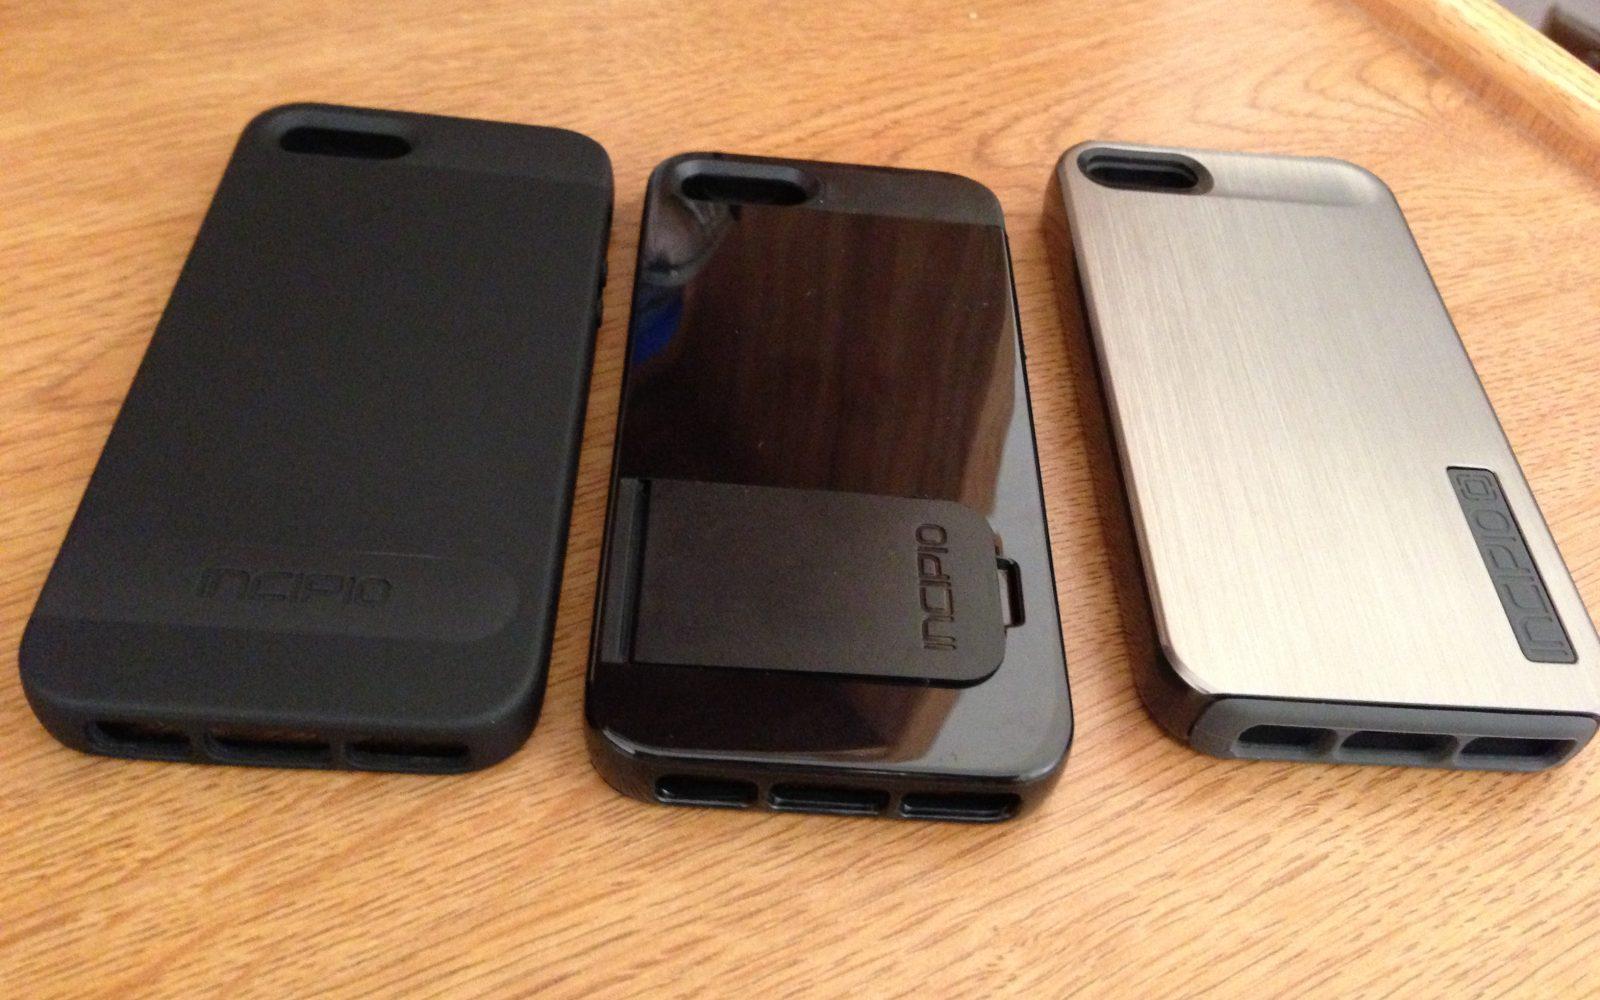 buy popular 9b96b a7c61 Review: Incipio iPhone 5 Kicksnap, DualPro SHINE, OVRMLD cases - 9to5Mac